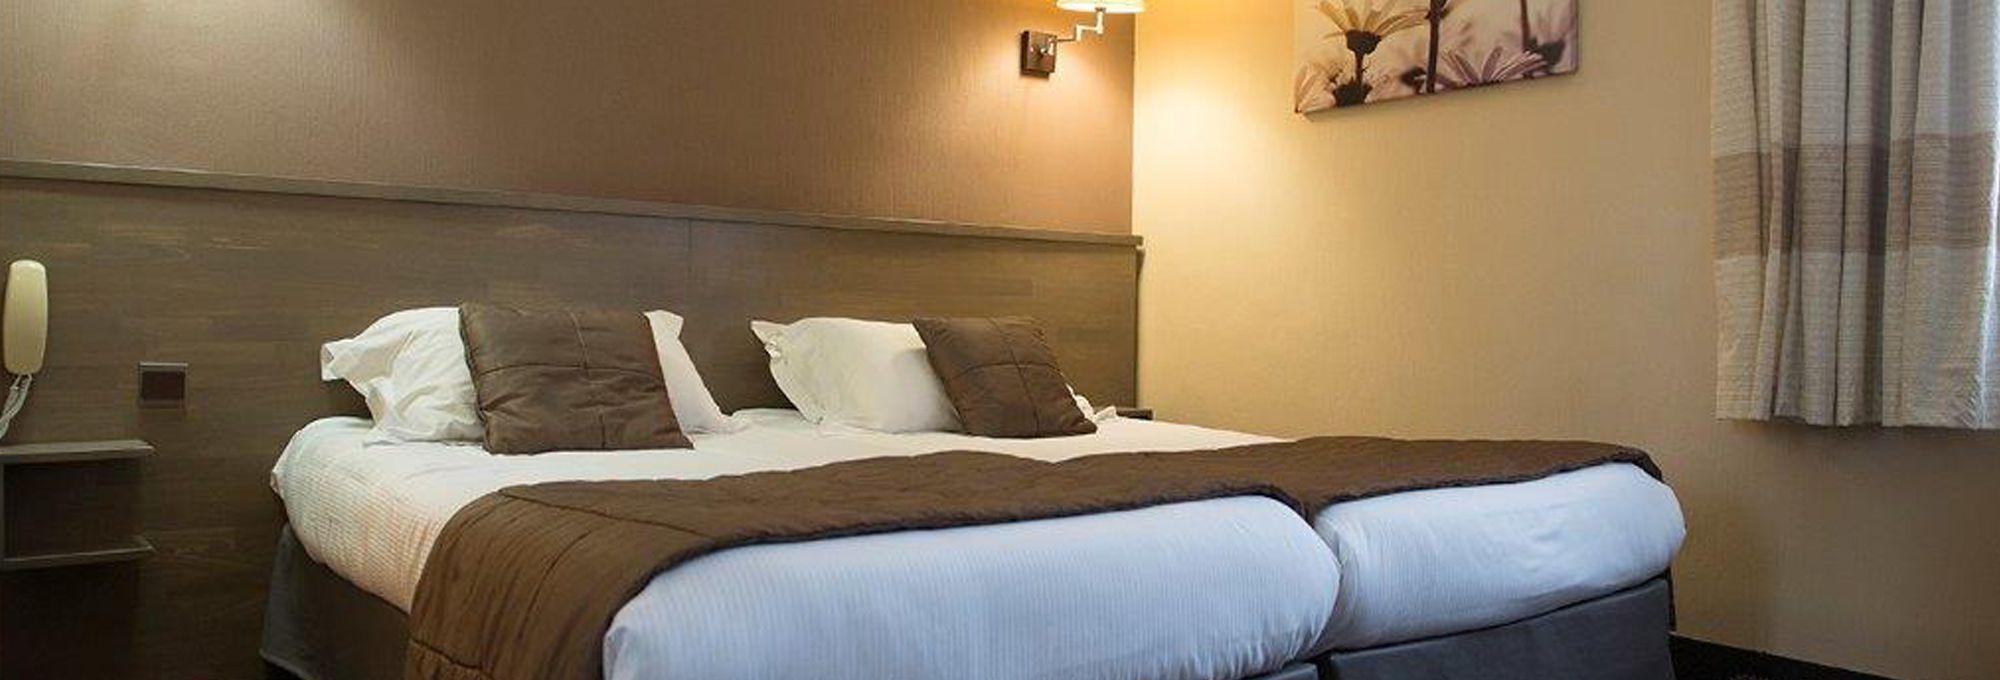 Hotel saint malo 3 toiles brit hotel le surcouf for Hotels 4 etoiles saint malo